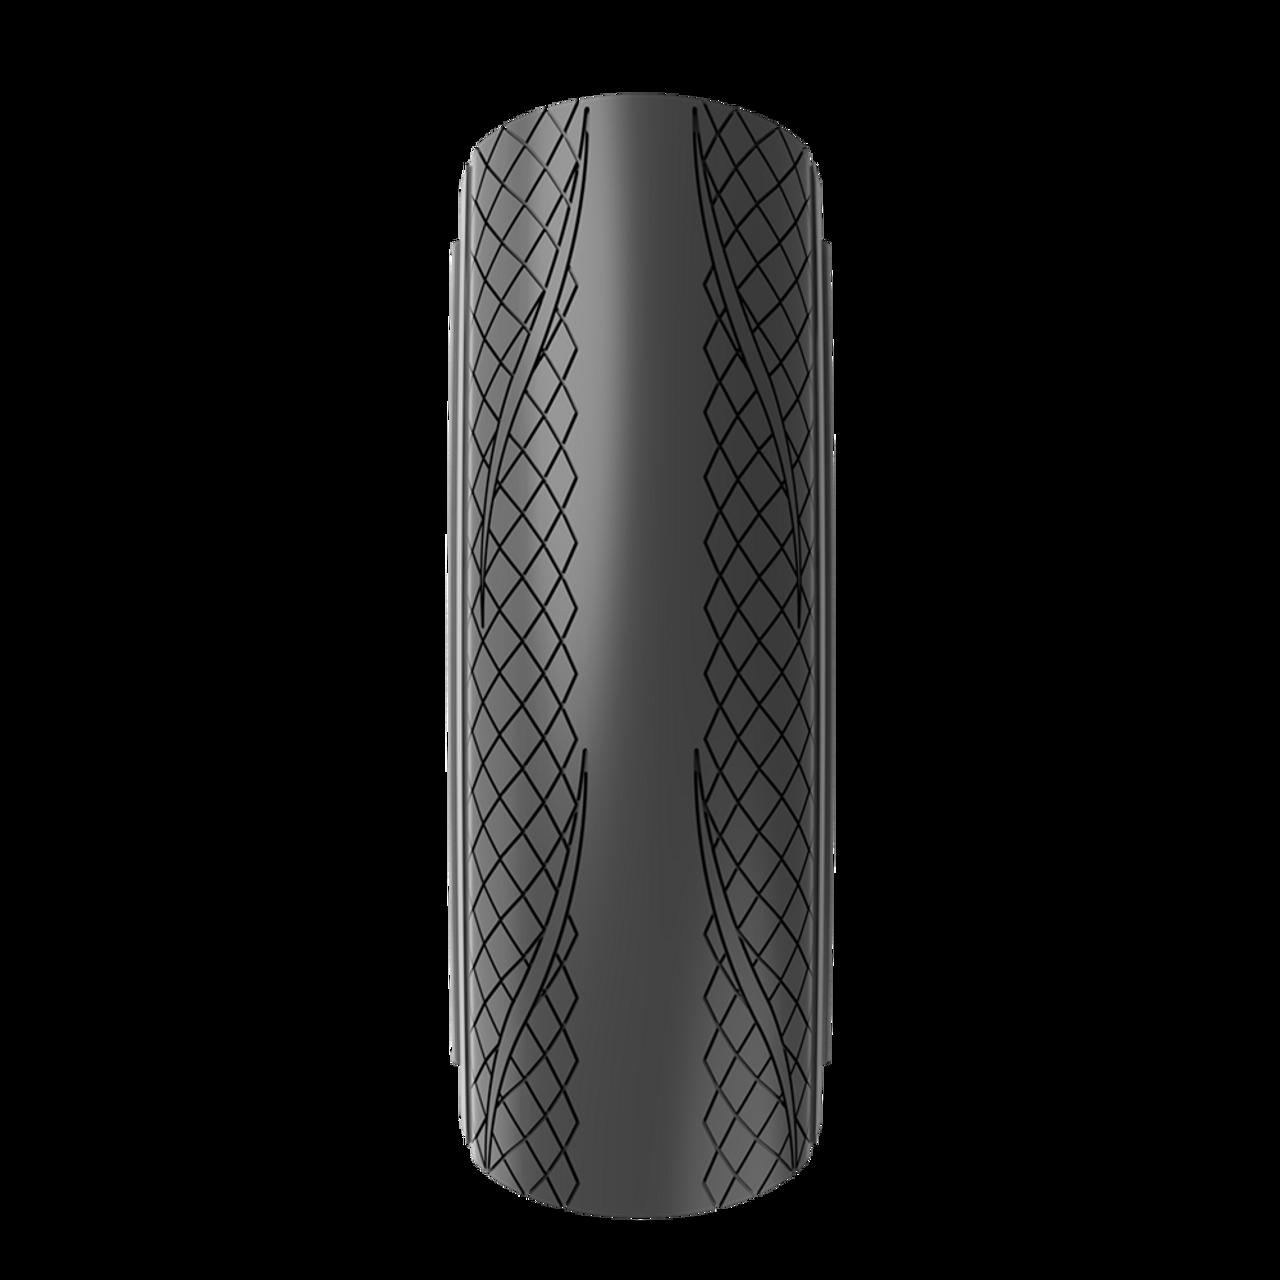 Vittoria Rubino Pro Speed G+ Folding Road Tyre 700 x 23c